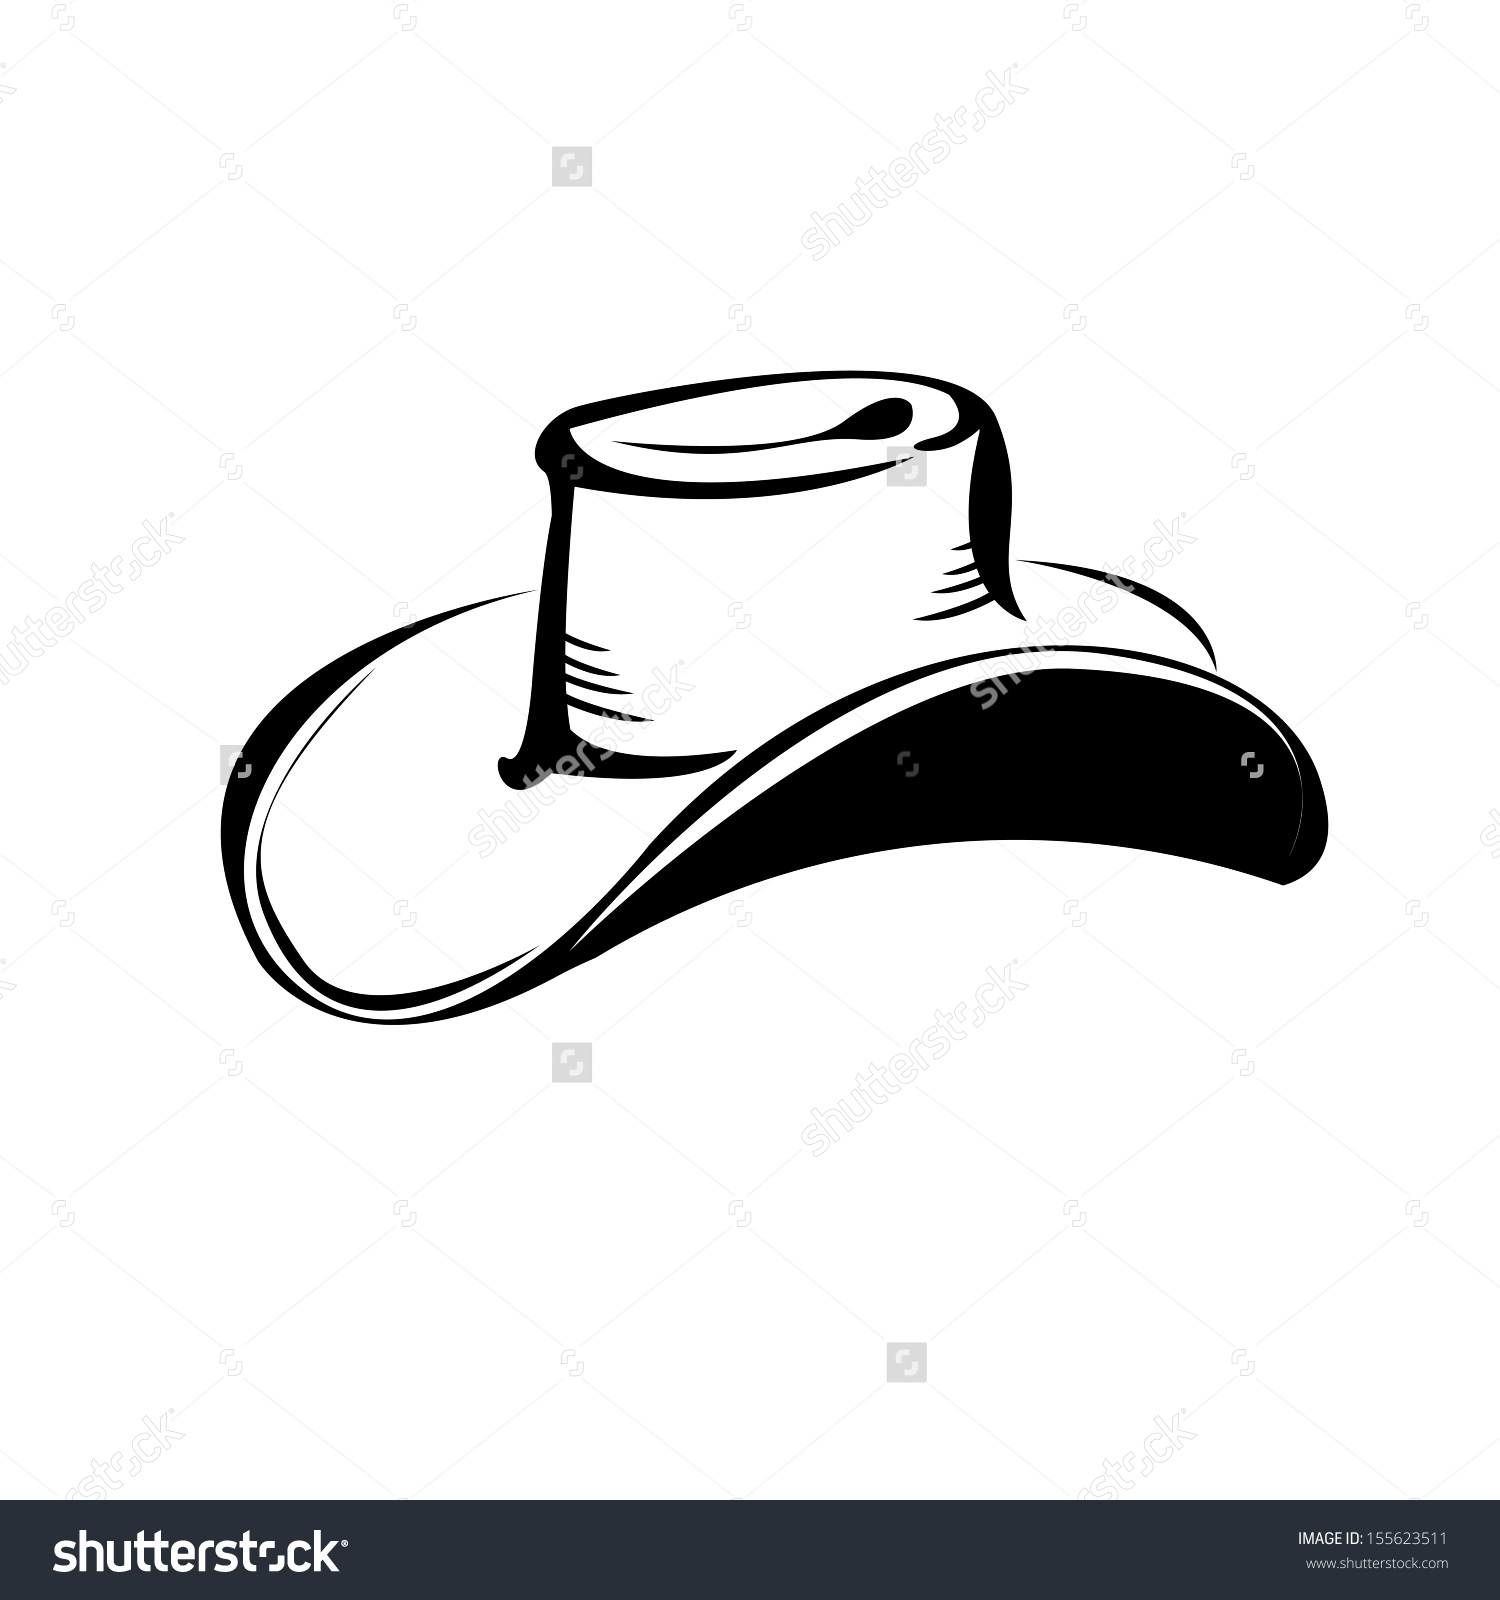 Cowboy Hat Silhouette Vector Illustration Stock Vector 155623511.